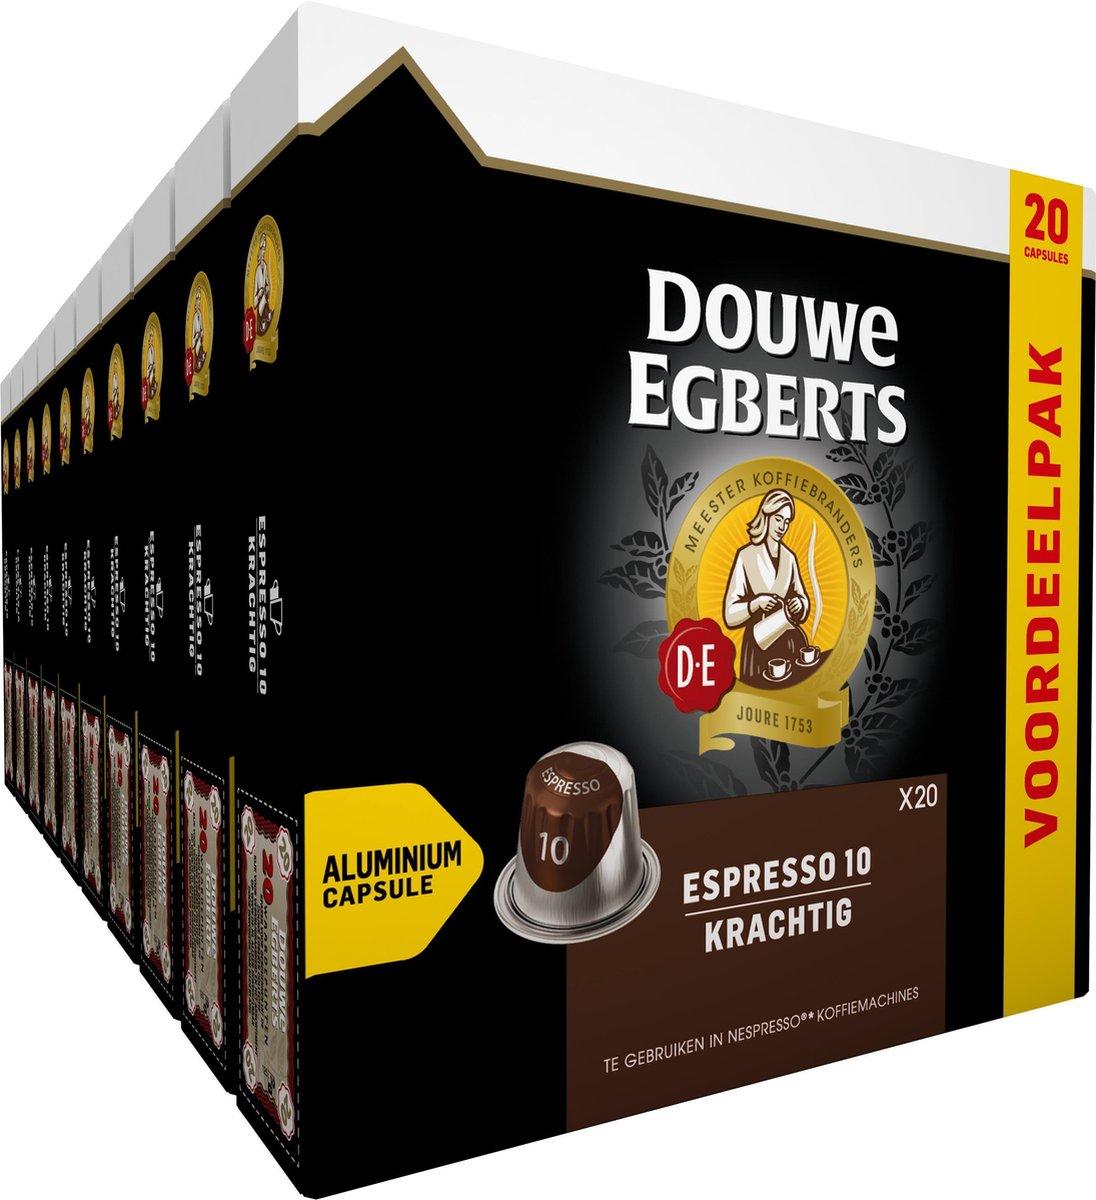 Douwe Egberts Espresso Krachtig Koffiecups - 10 x 20 cups - voordeelpak - 200 koffiecups